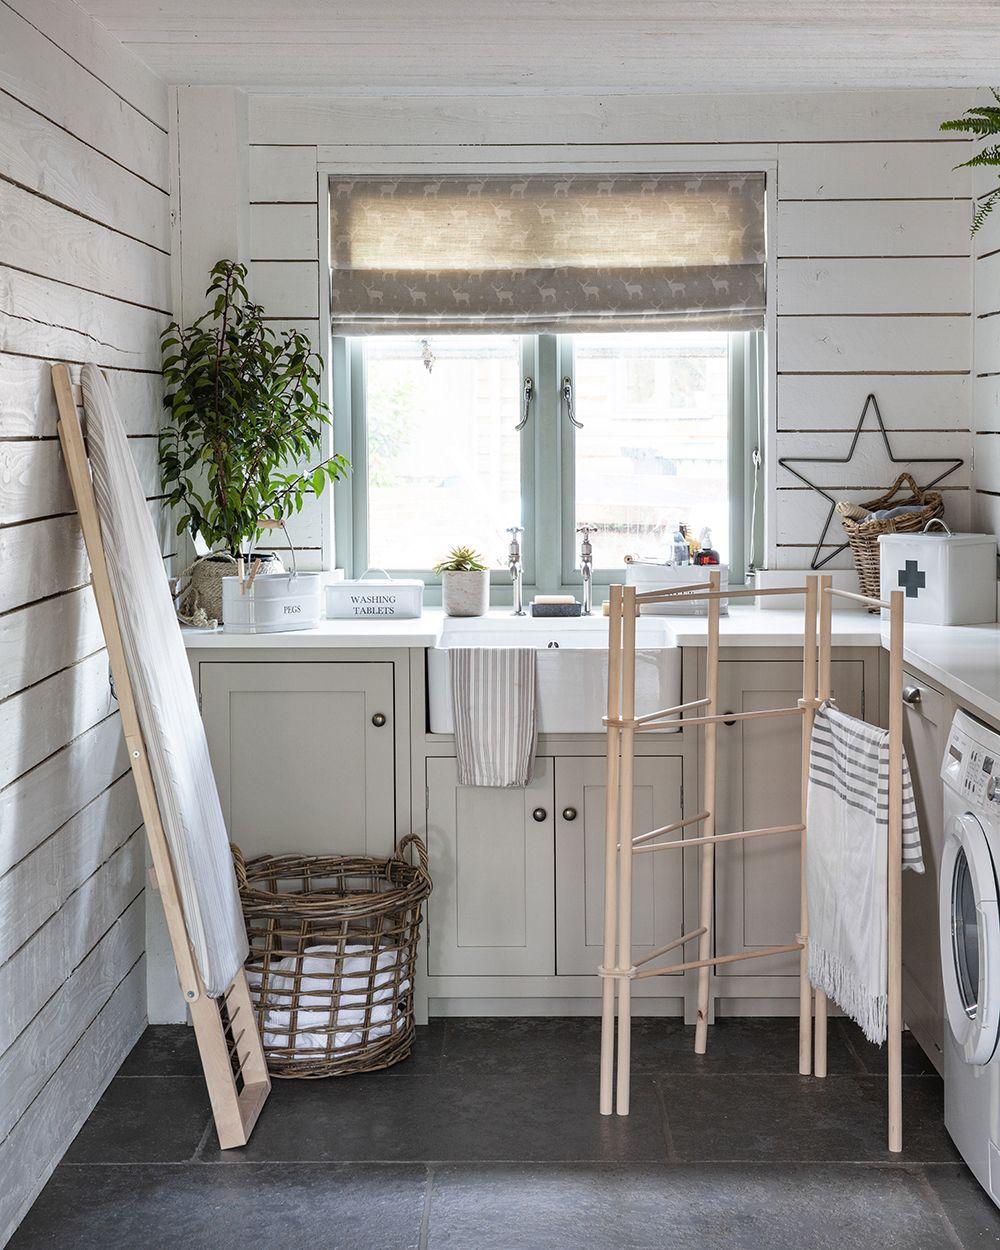 12 small utility room ideas – stylish, practical inspiration ...